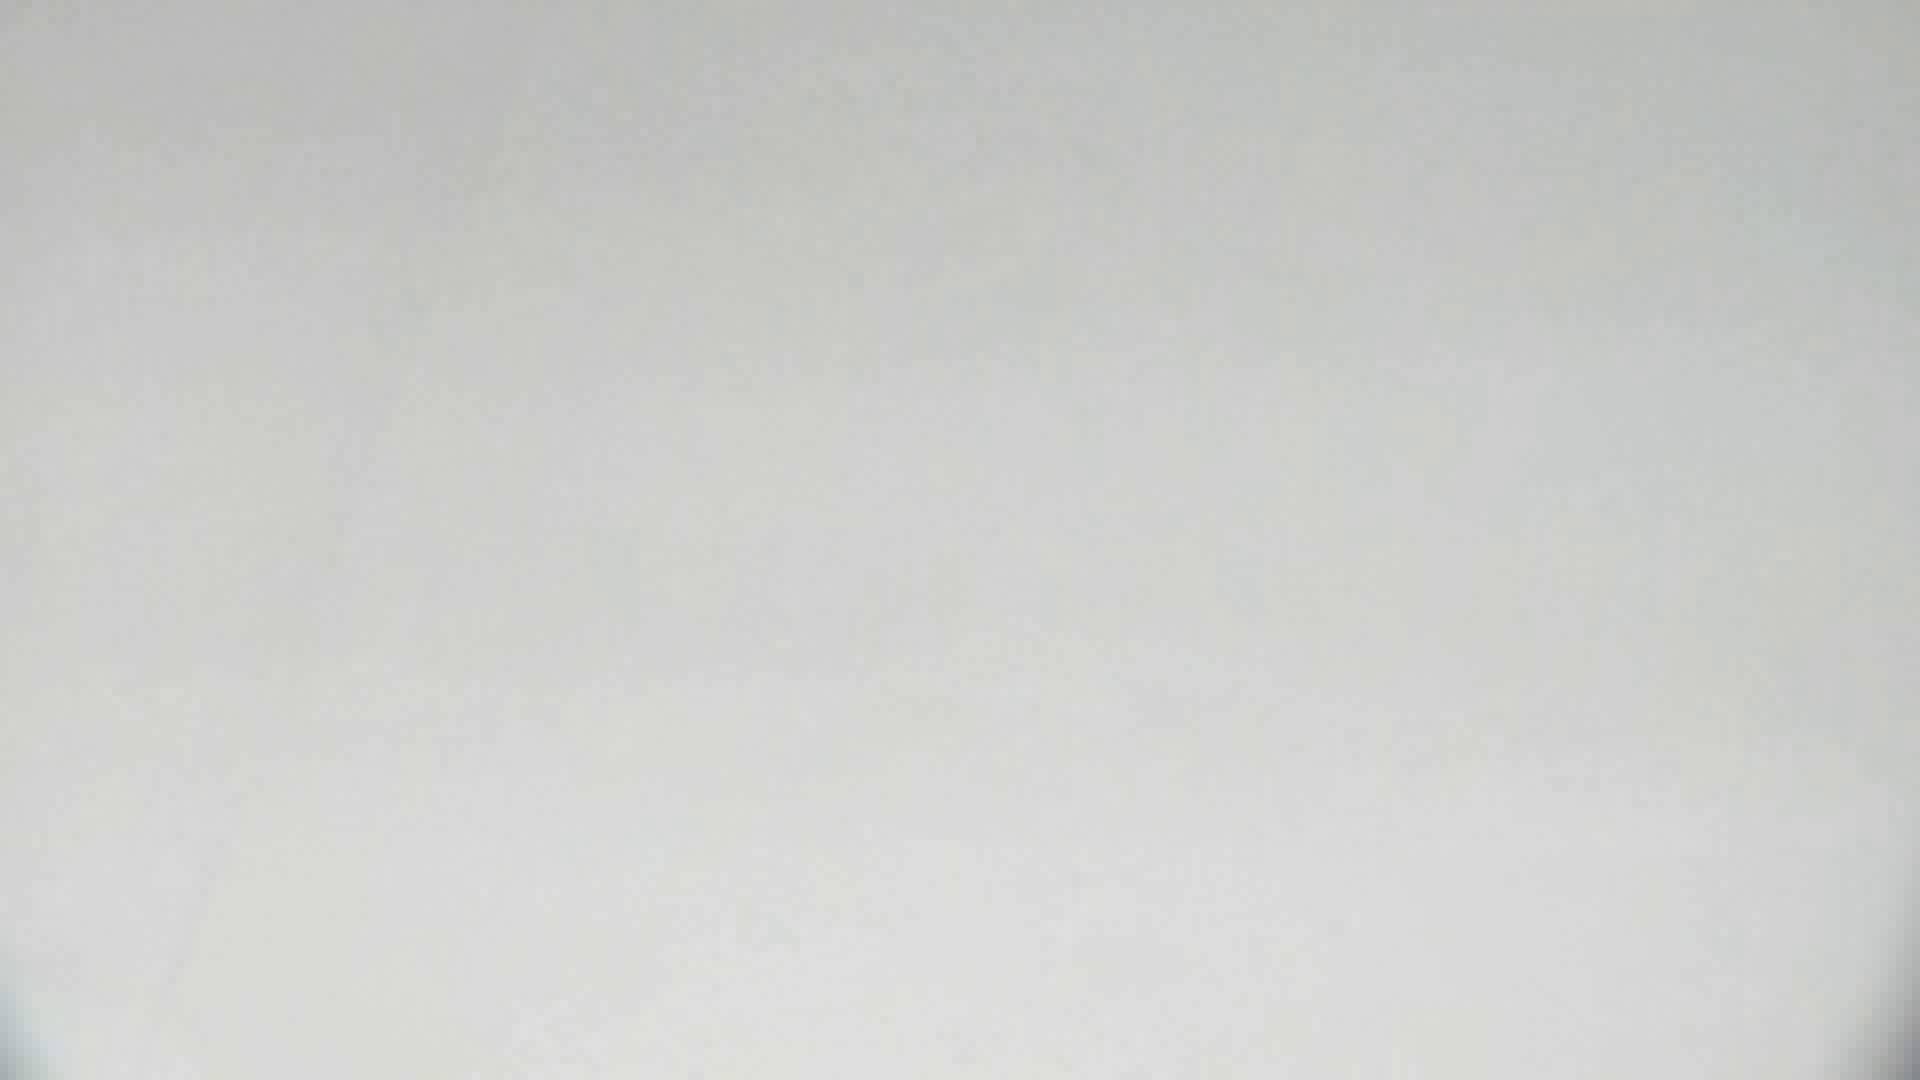 vol.25三十時間潜り、一つしか出会えない完璧桃尻編 byお銀 洗面所  92pic 12